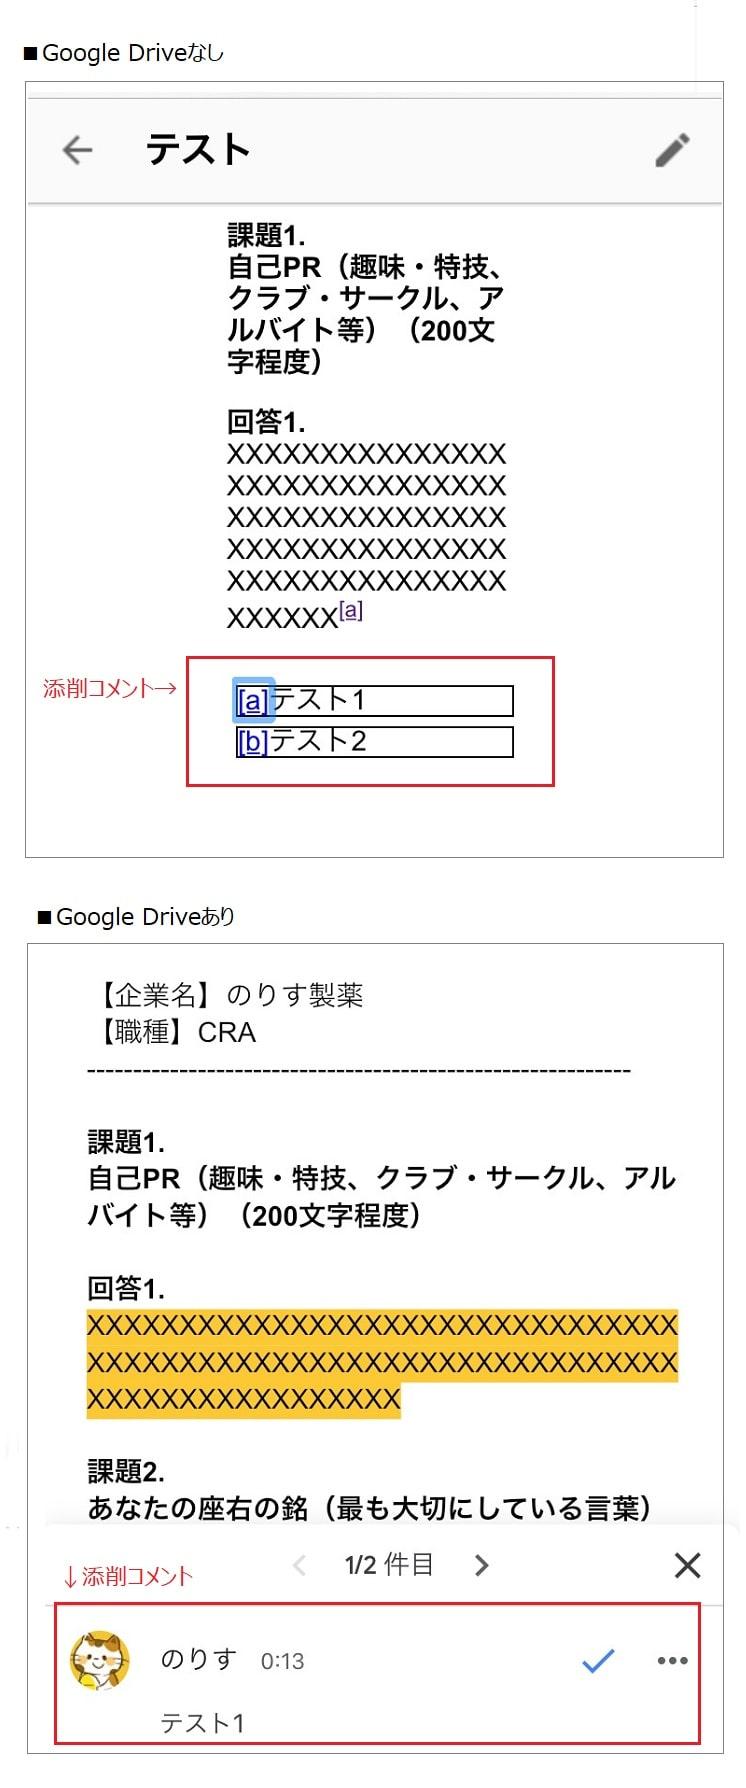 Google Driveの有無の比較